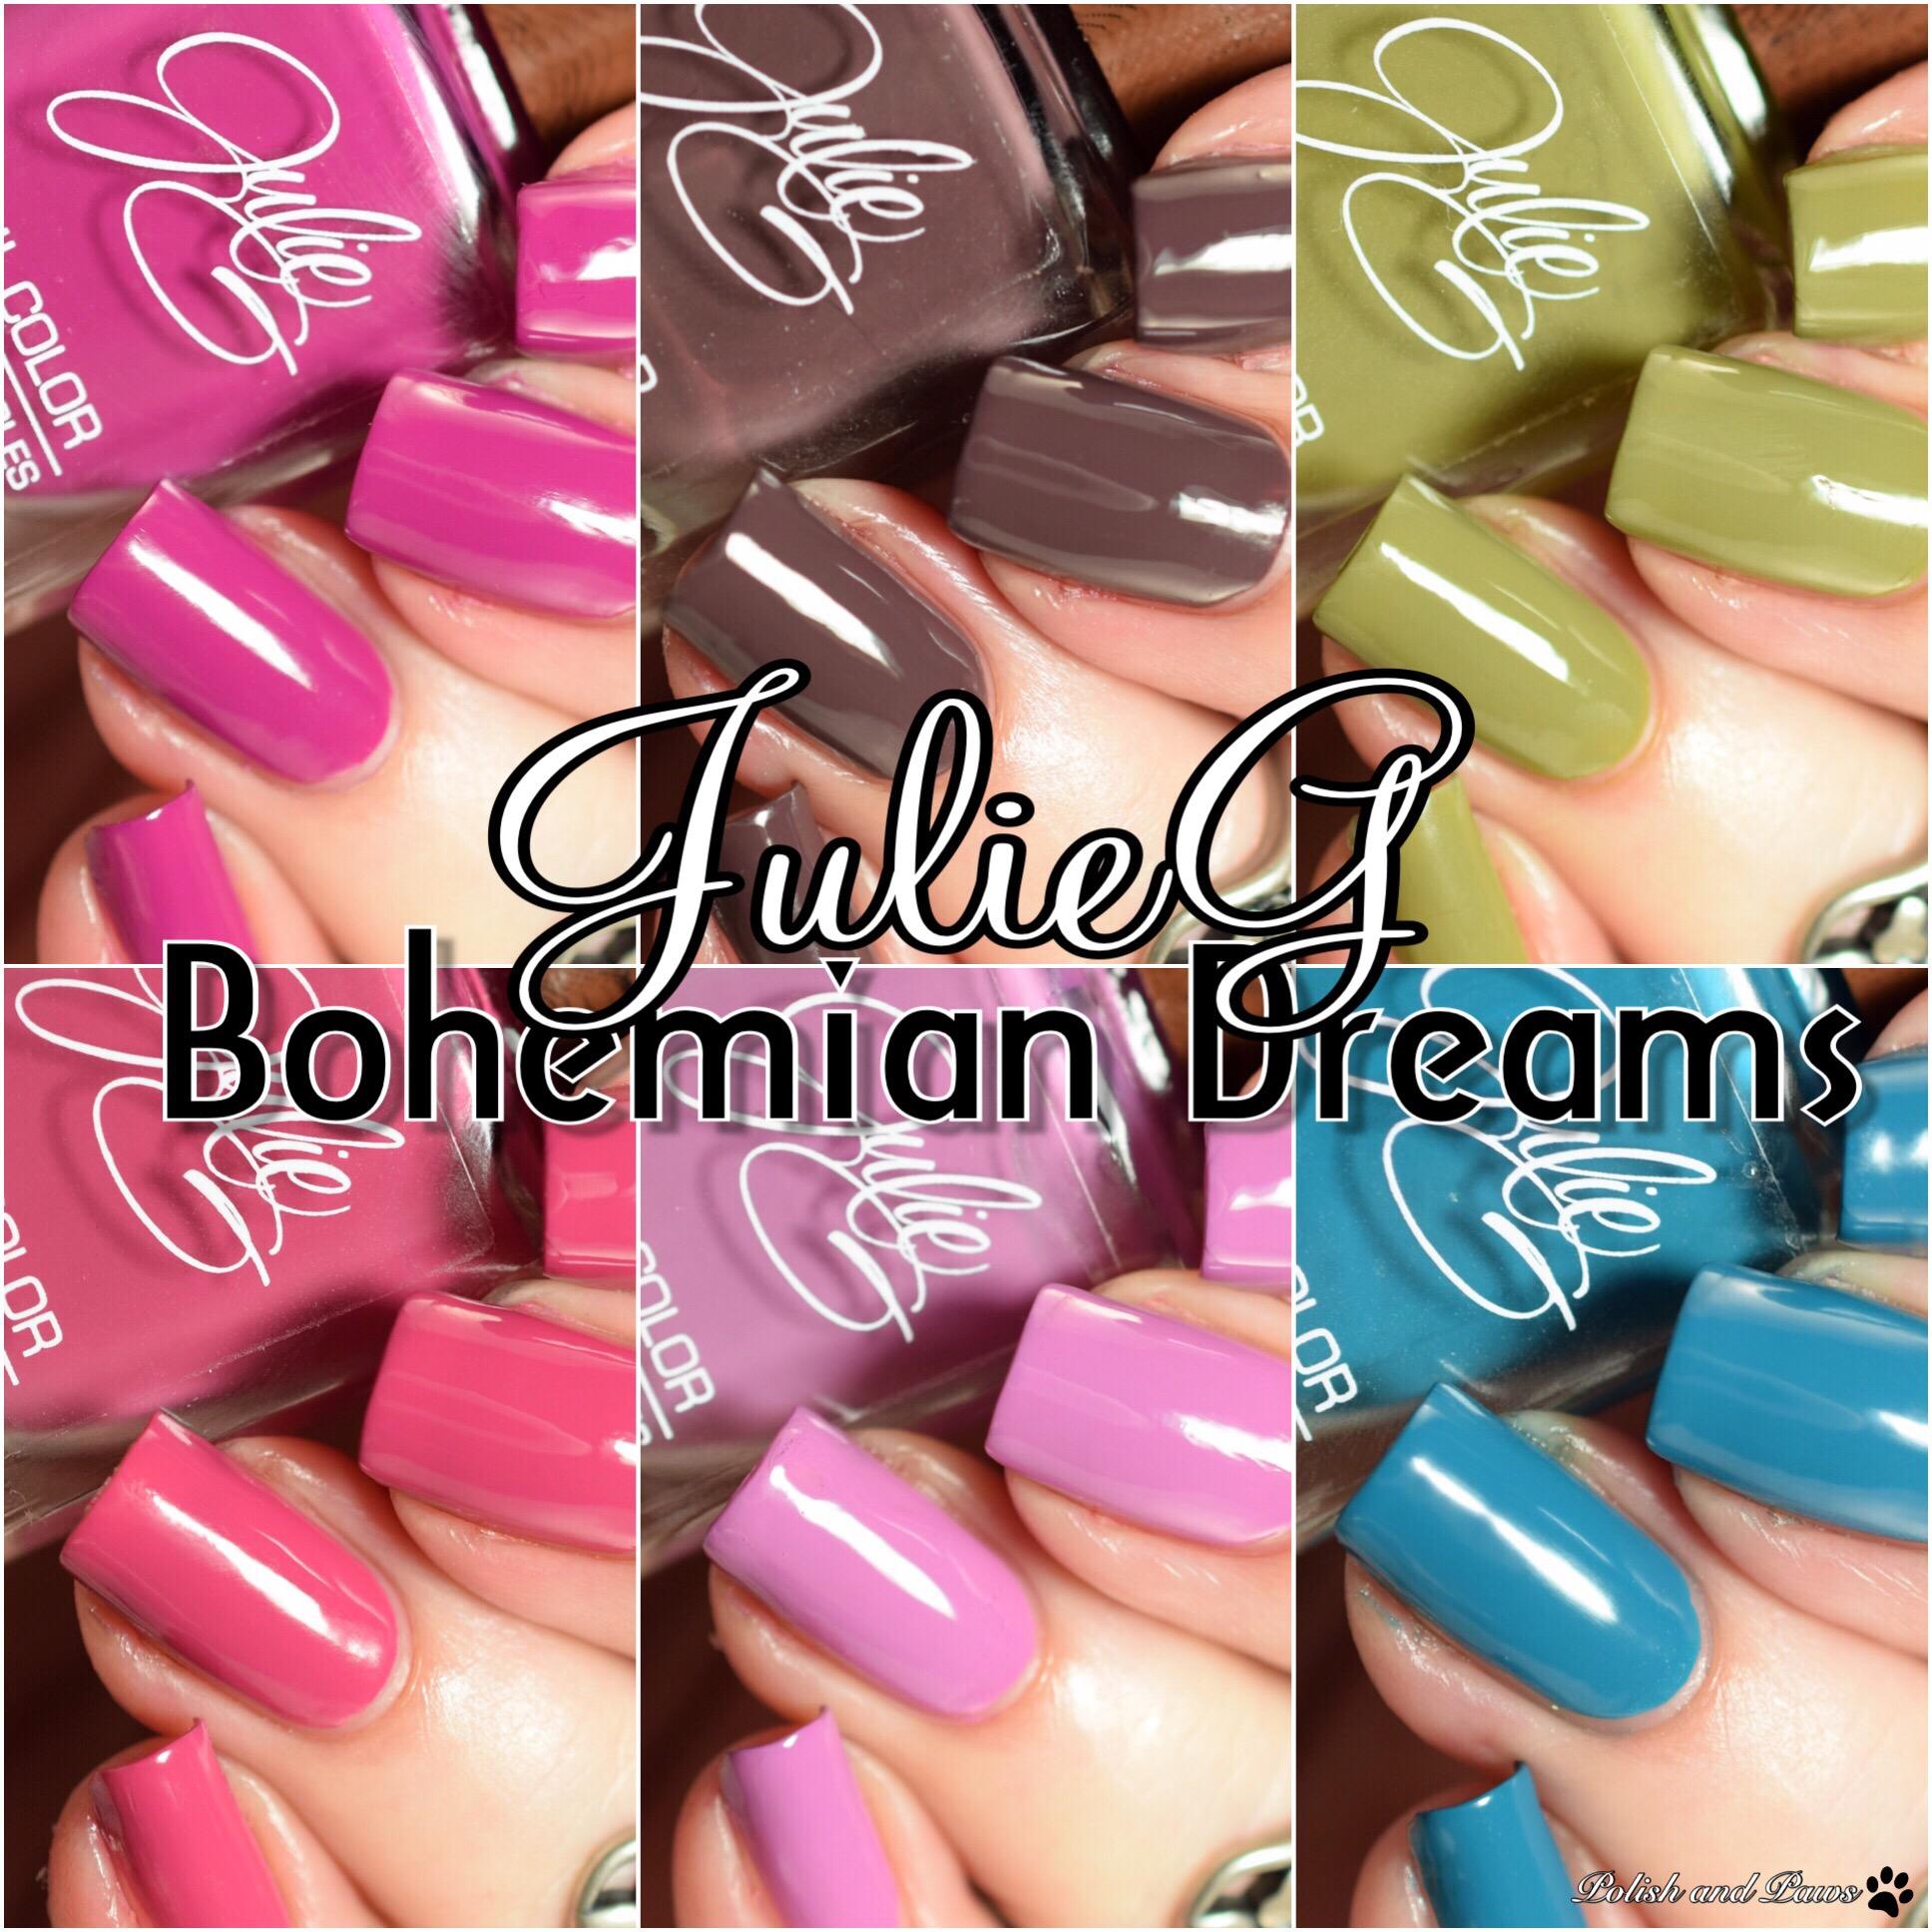 JulieG Bohemian Dreams